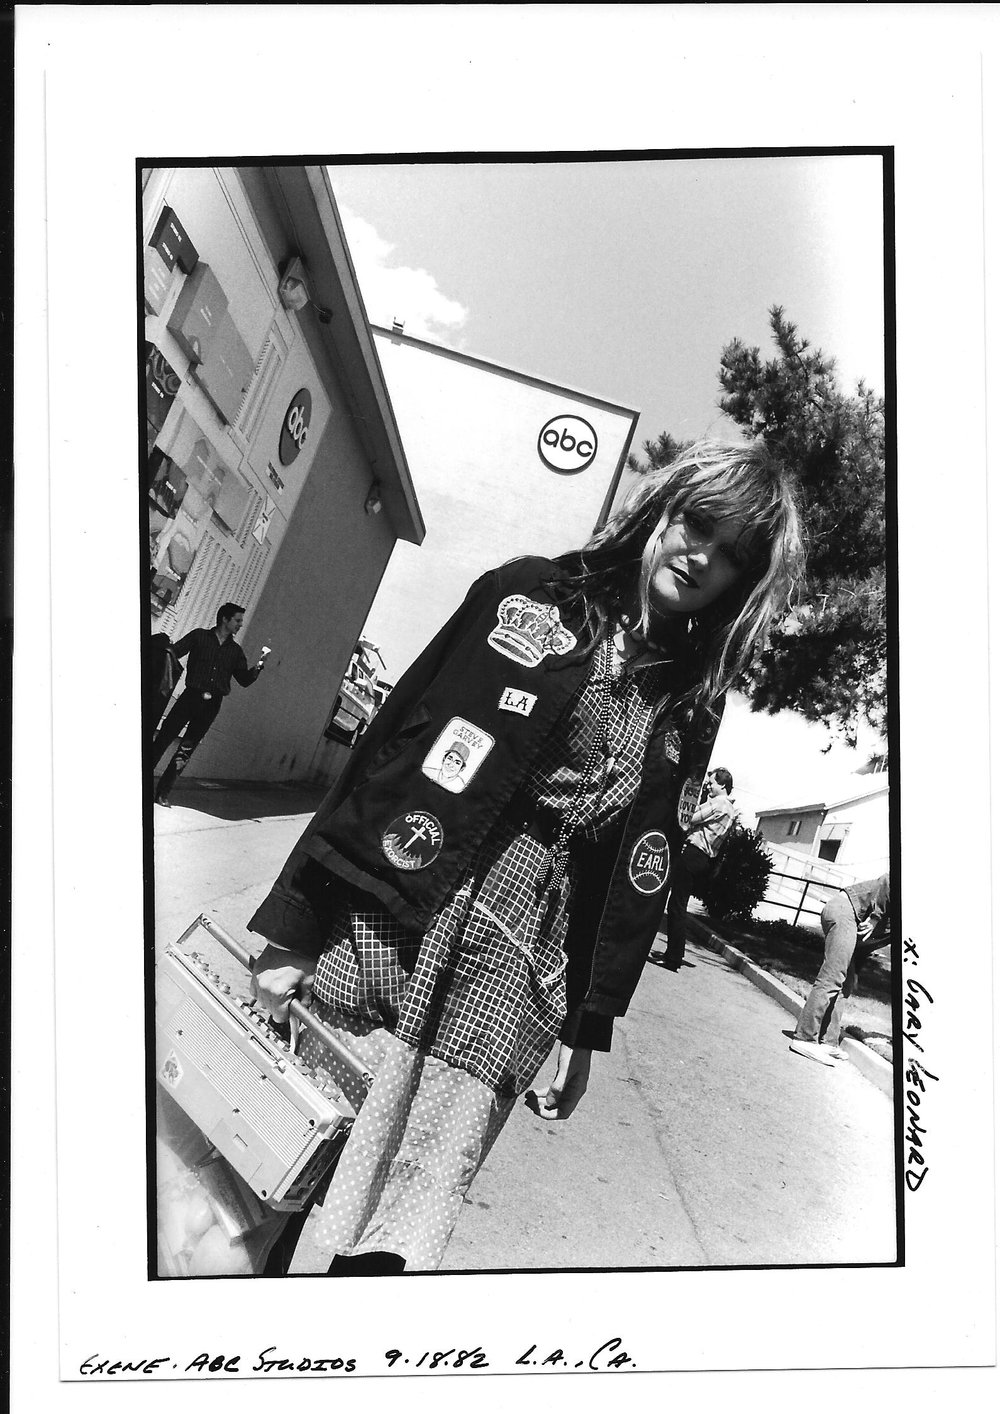 exenegaryleonardpic1982.jpg